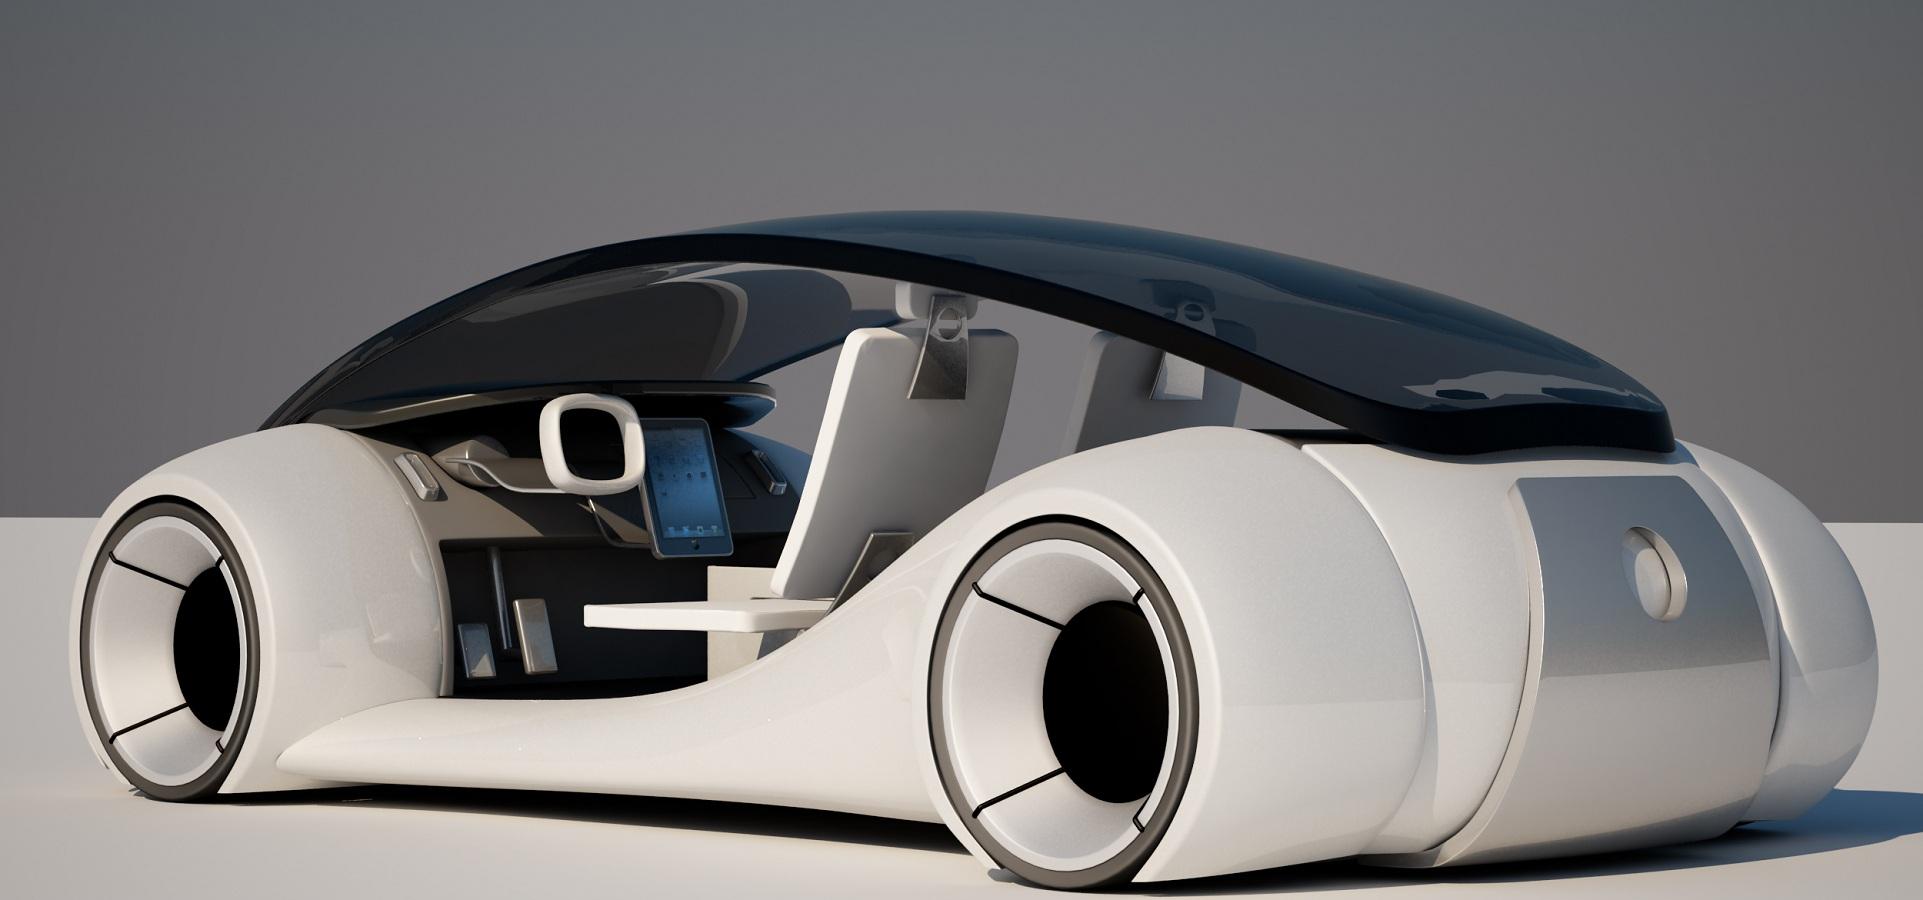 Volkswagen Commercialisera La Premi 232 Re Icar De Apple 224